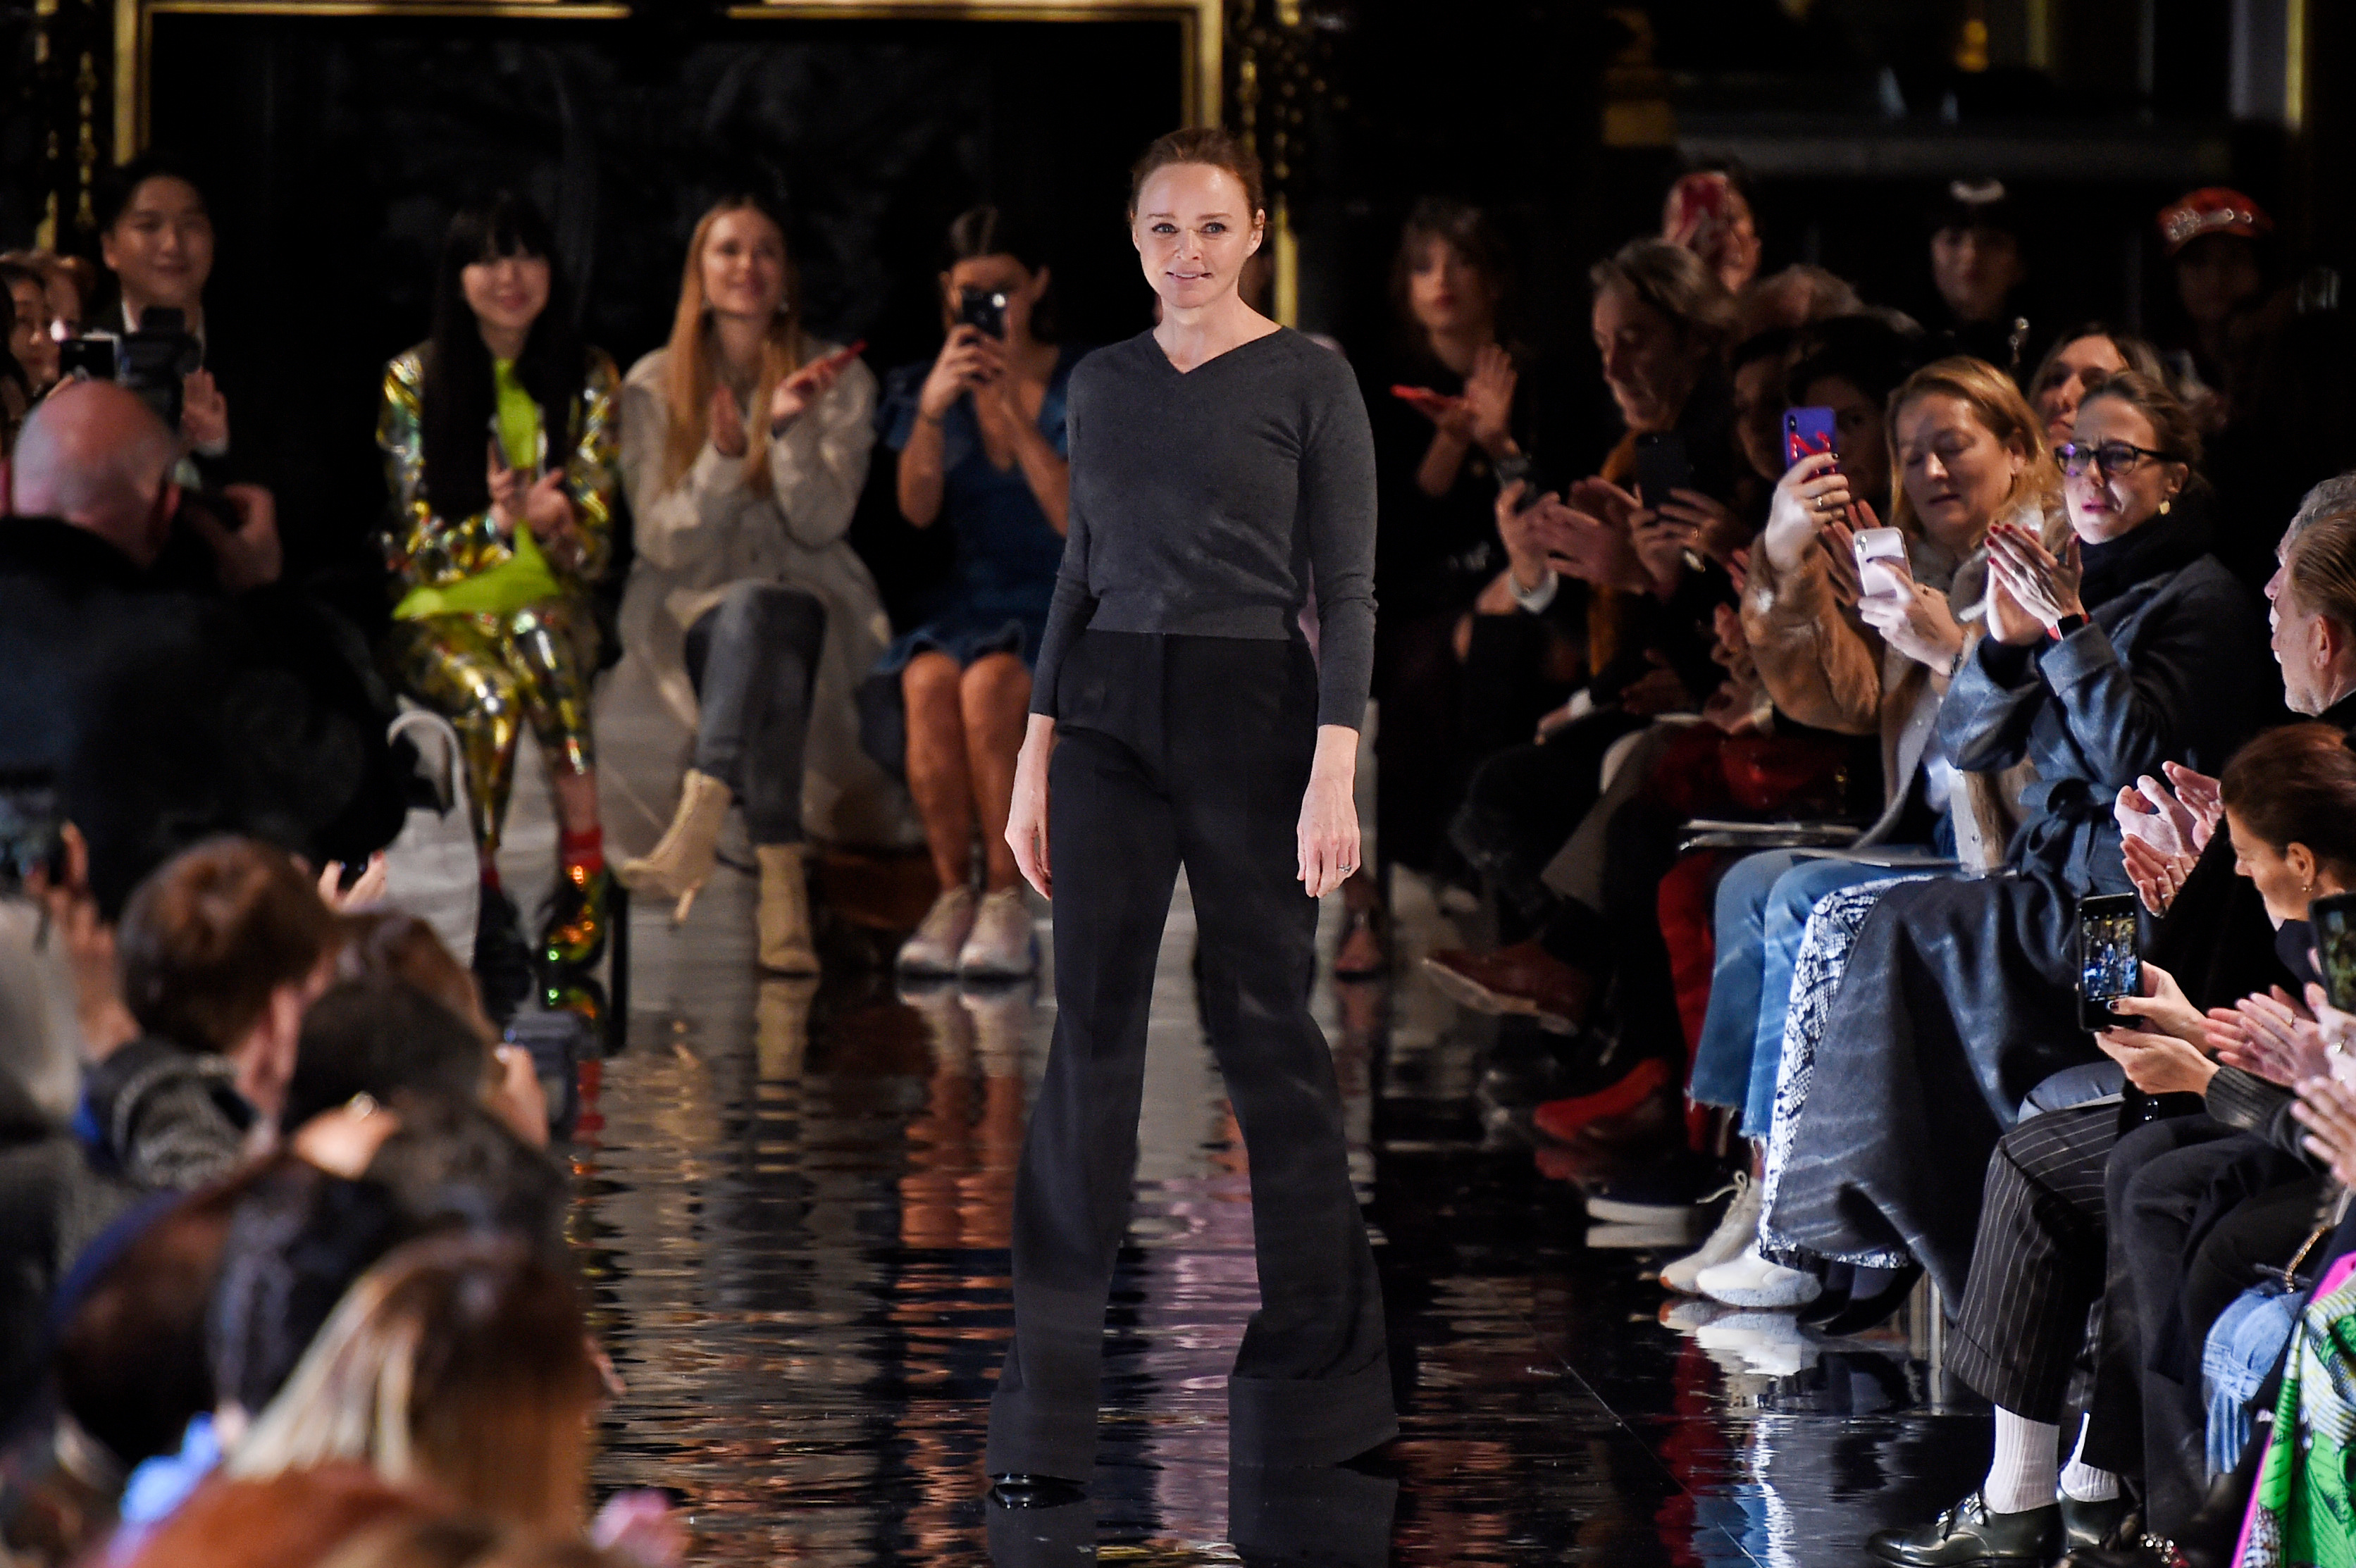 Stella McCartney on the catwalkStella McCartney show, Runway, Fall Winter 2018, Paris Fashion Week, France - 05 Mar 2018